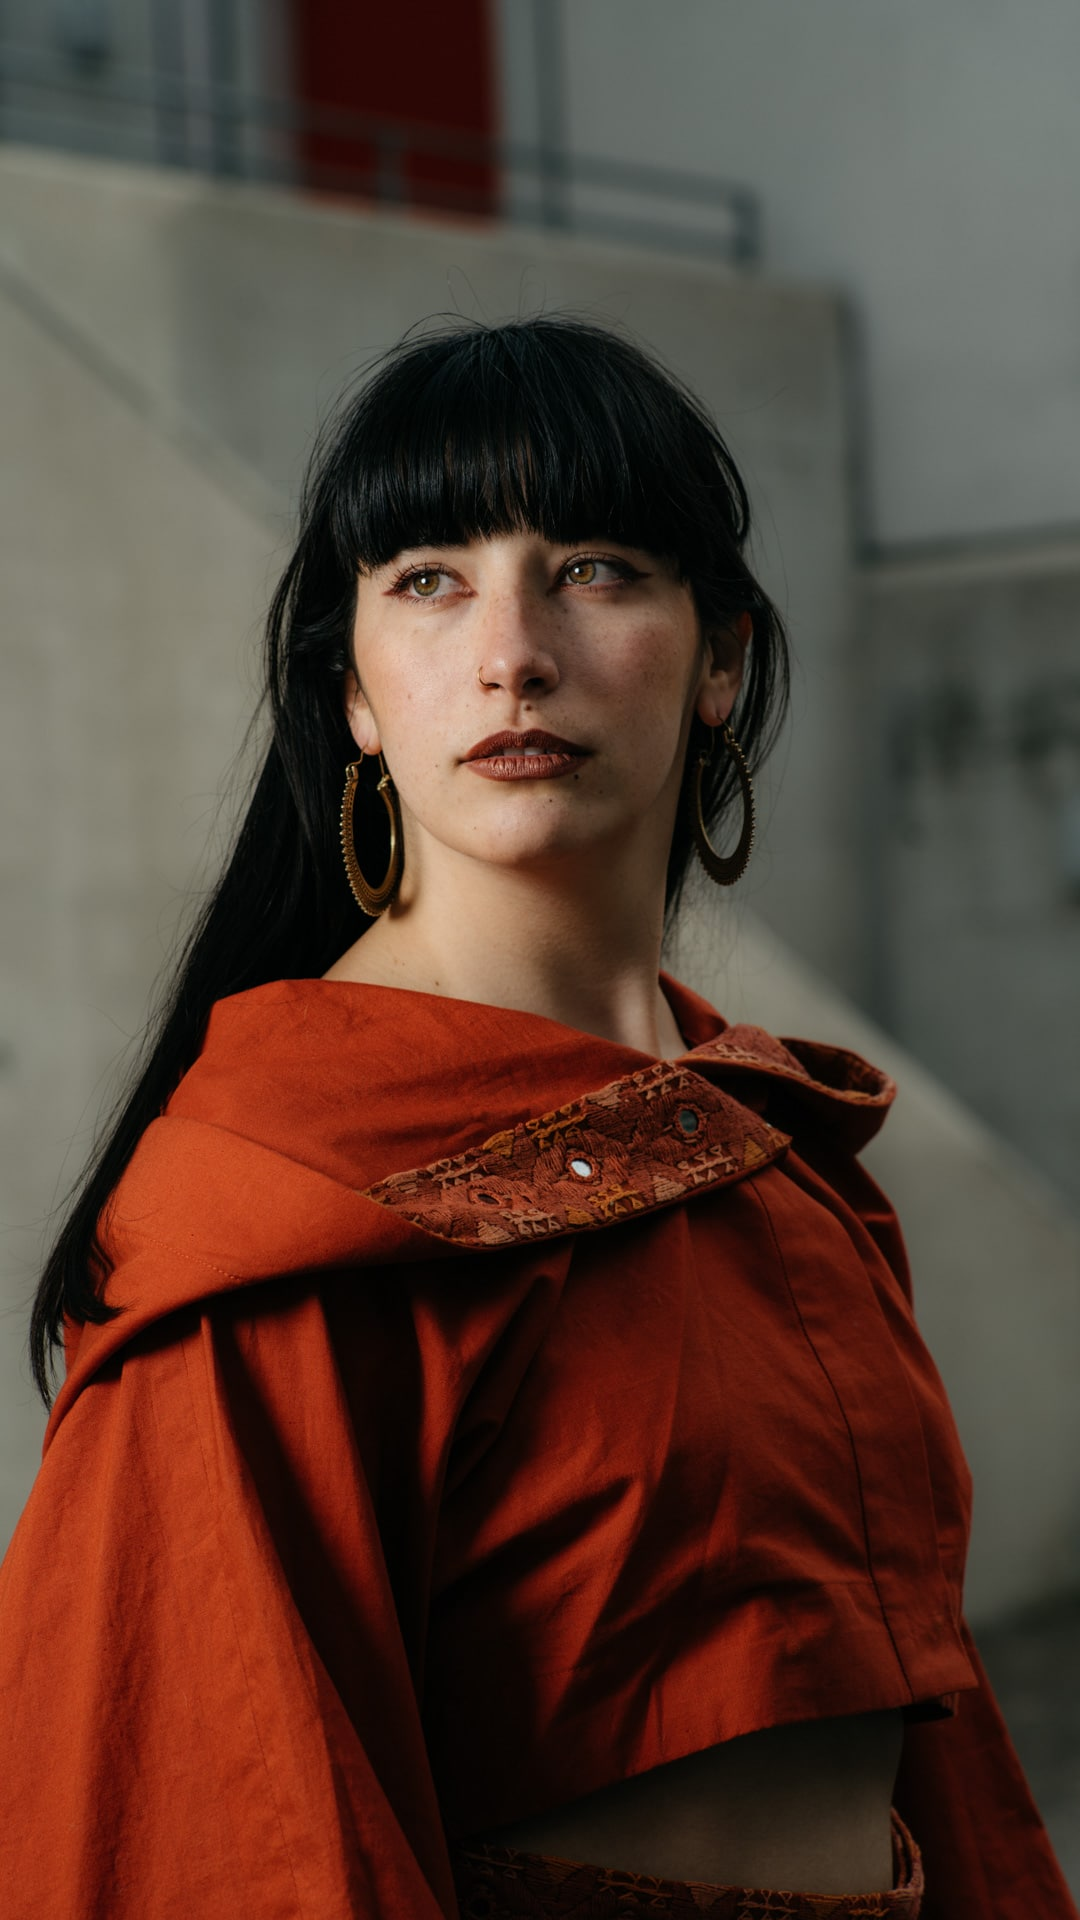 Giulia Dabalà